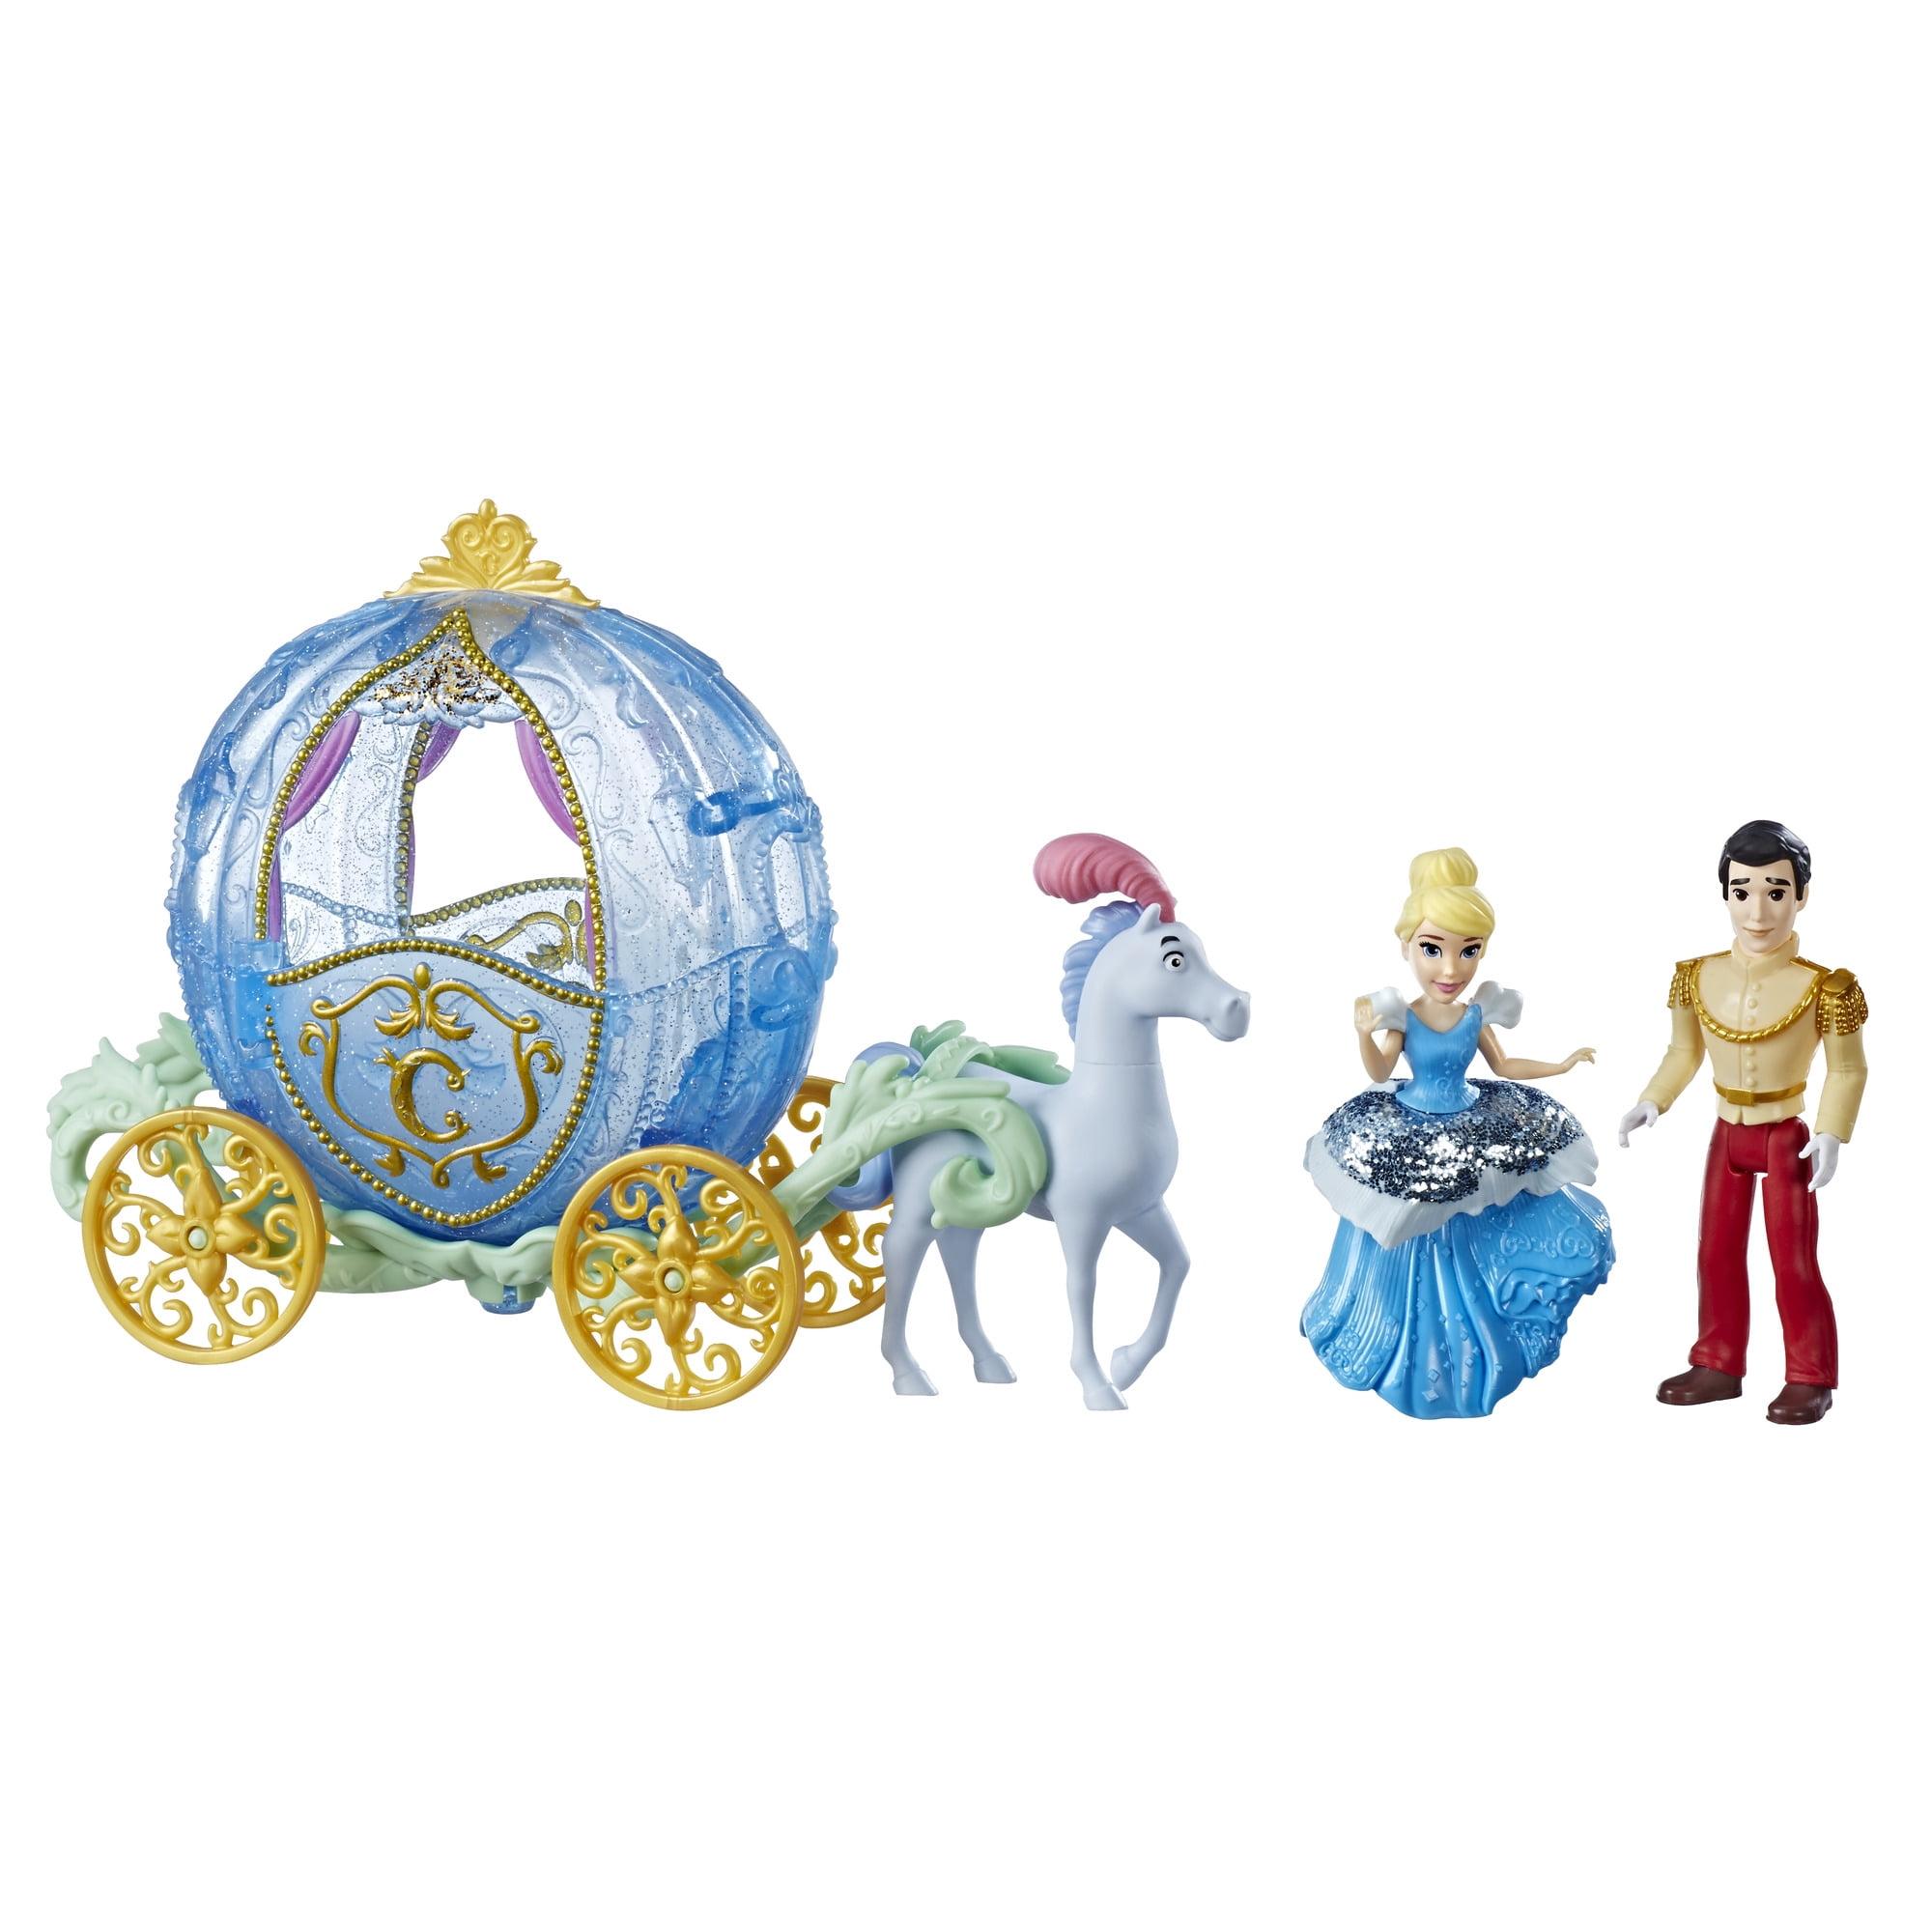 Disney Princess Royal Carriage Ride, Cinderella and Prince Charming